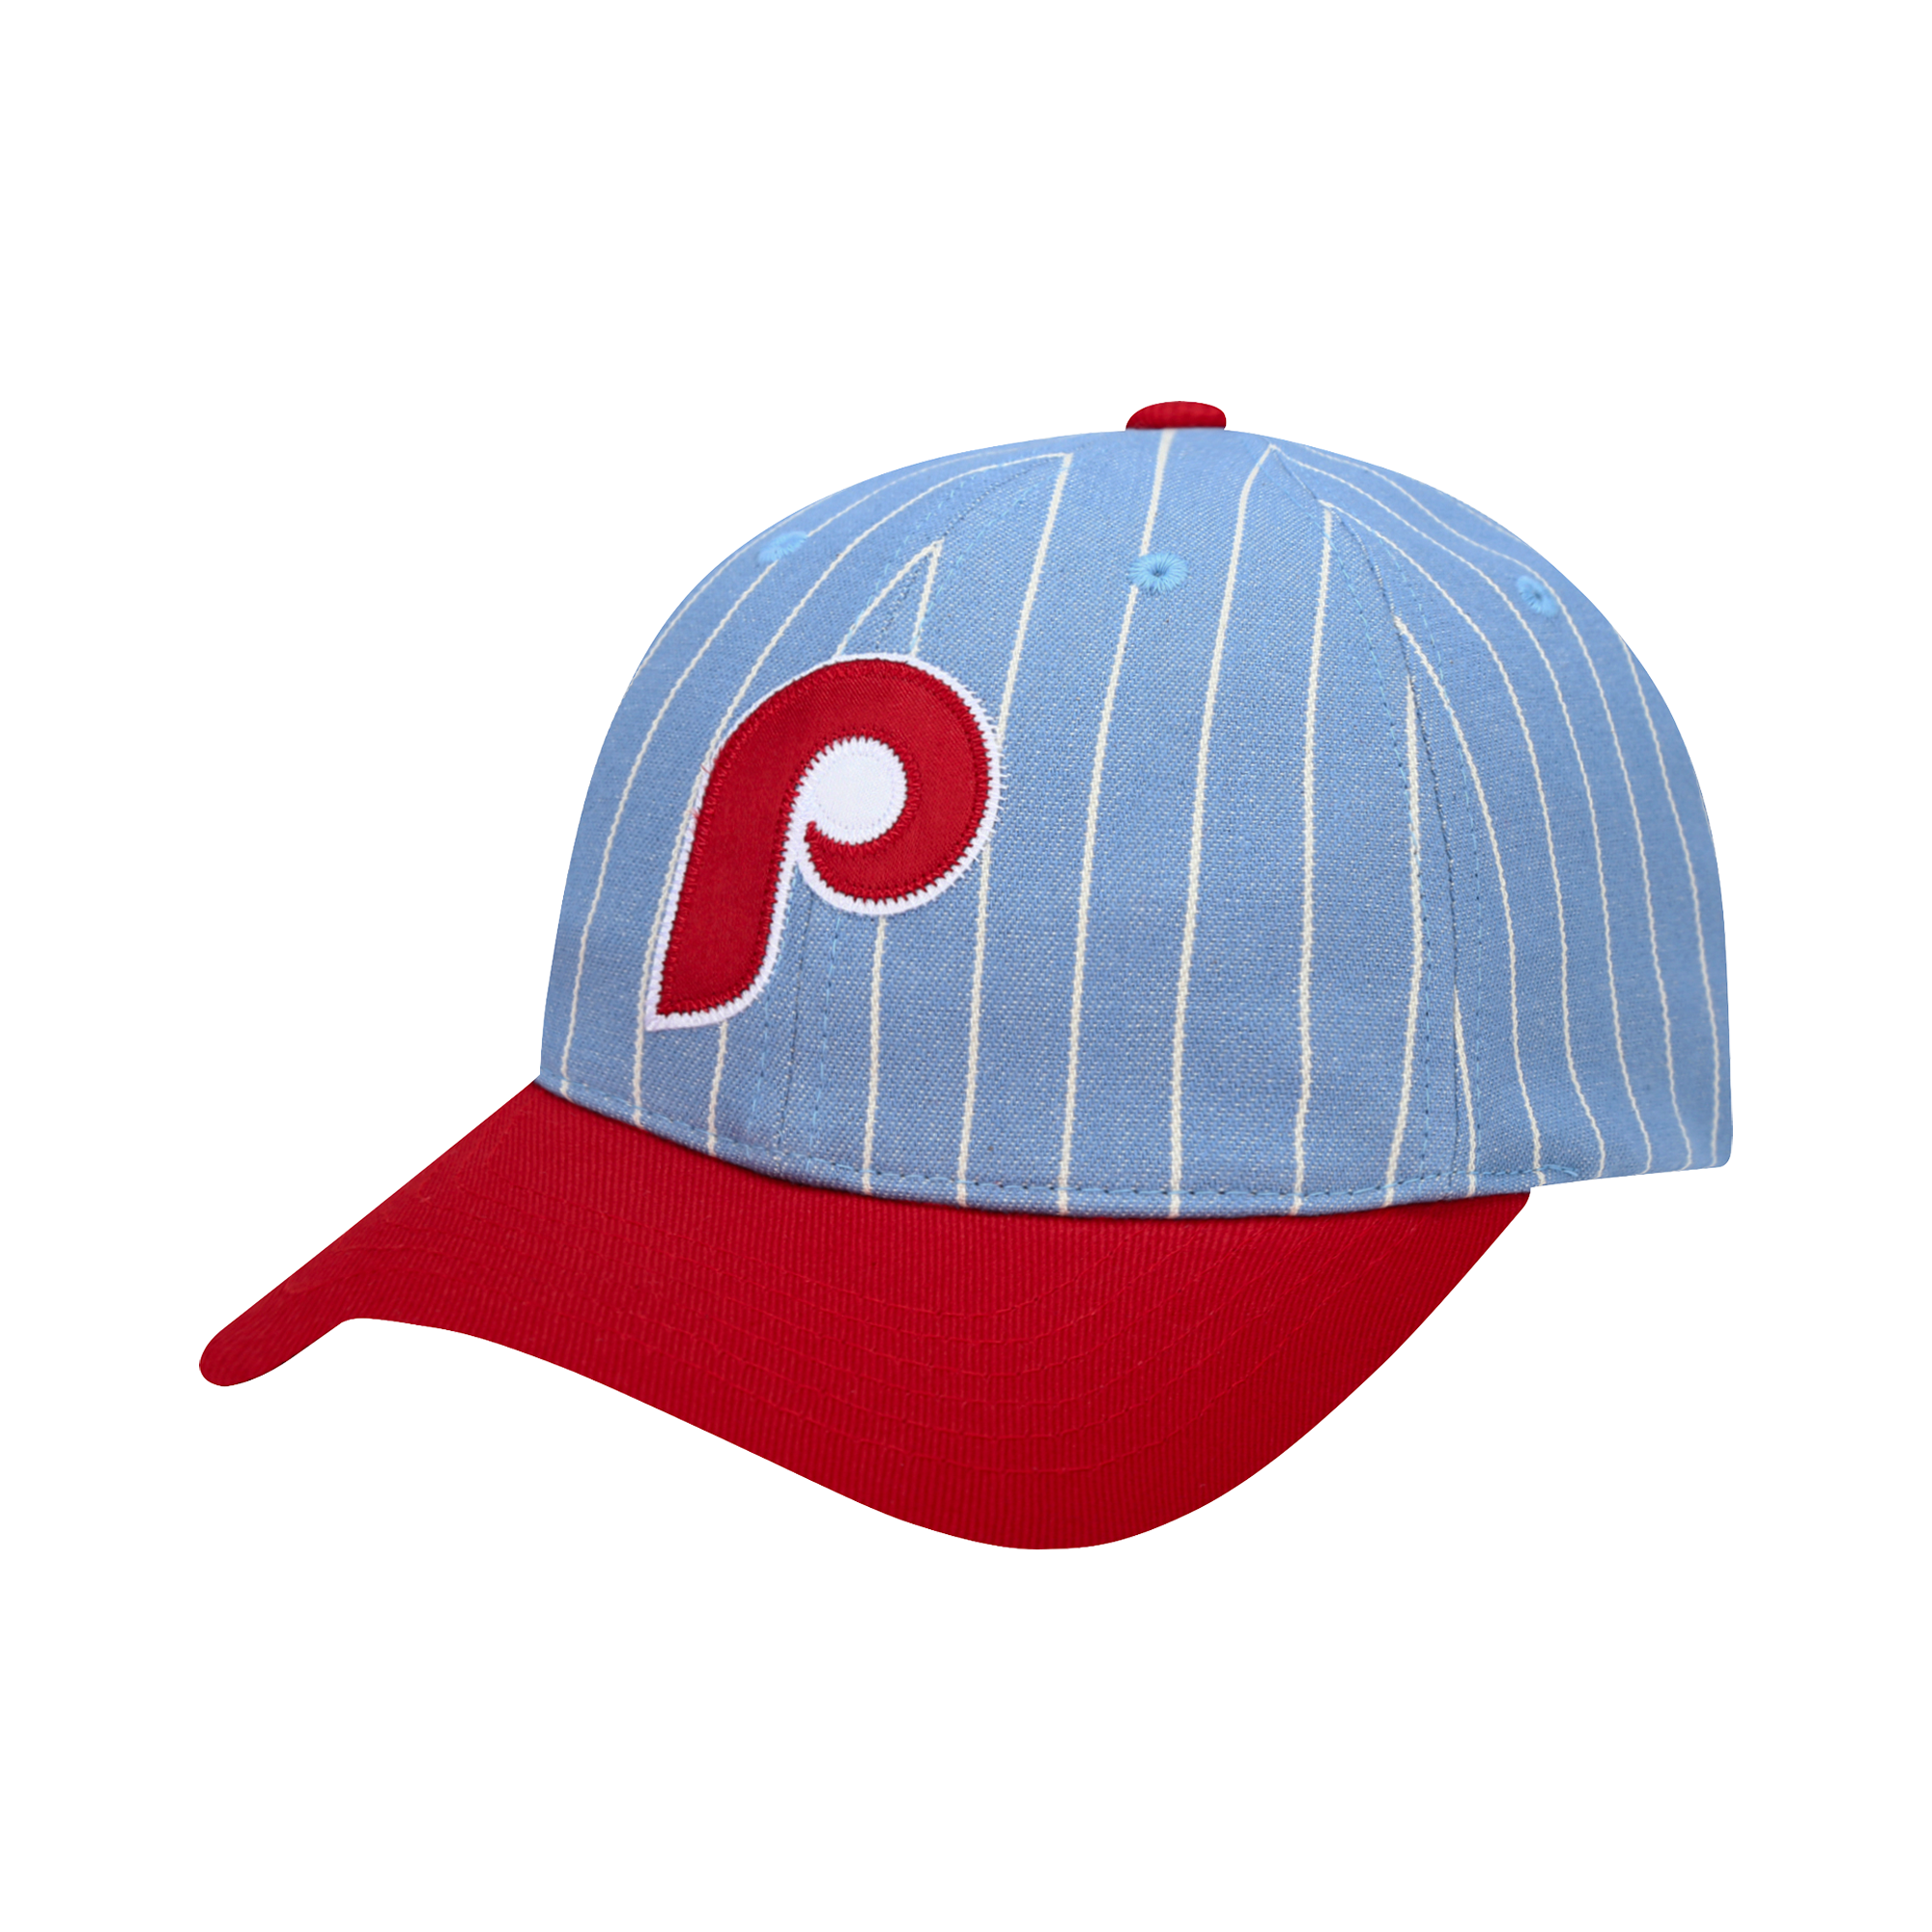 PHILADELPHIA PHILLIES COOPERS STRIPE JERSEY BALL CAP